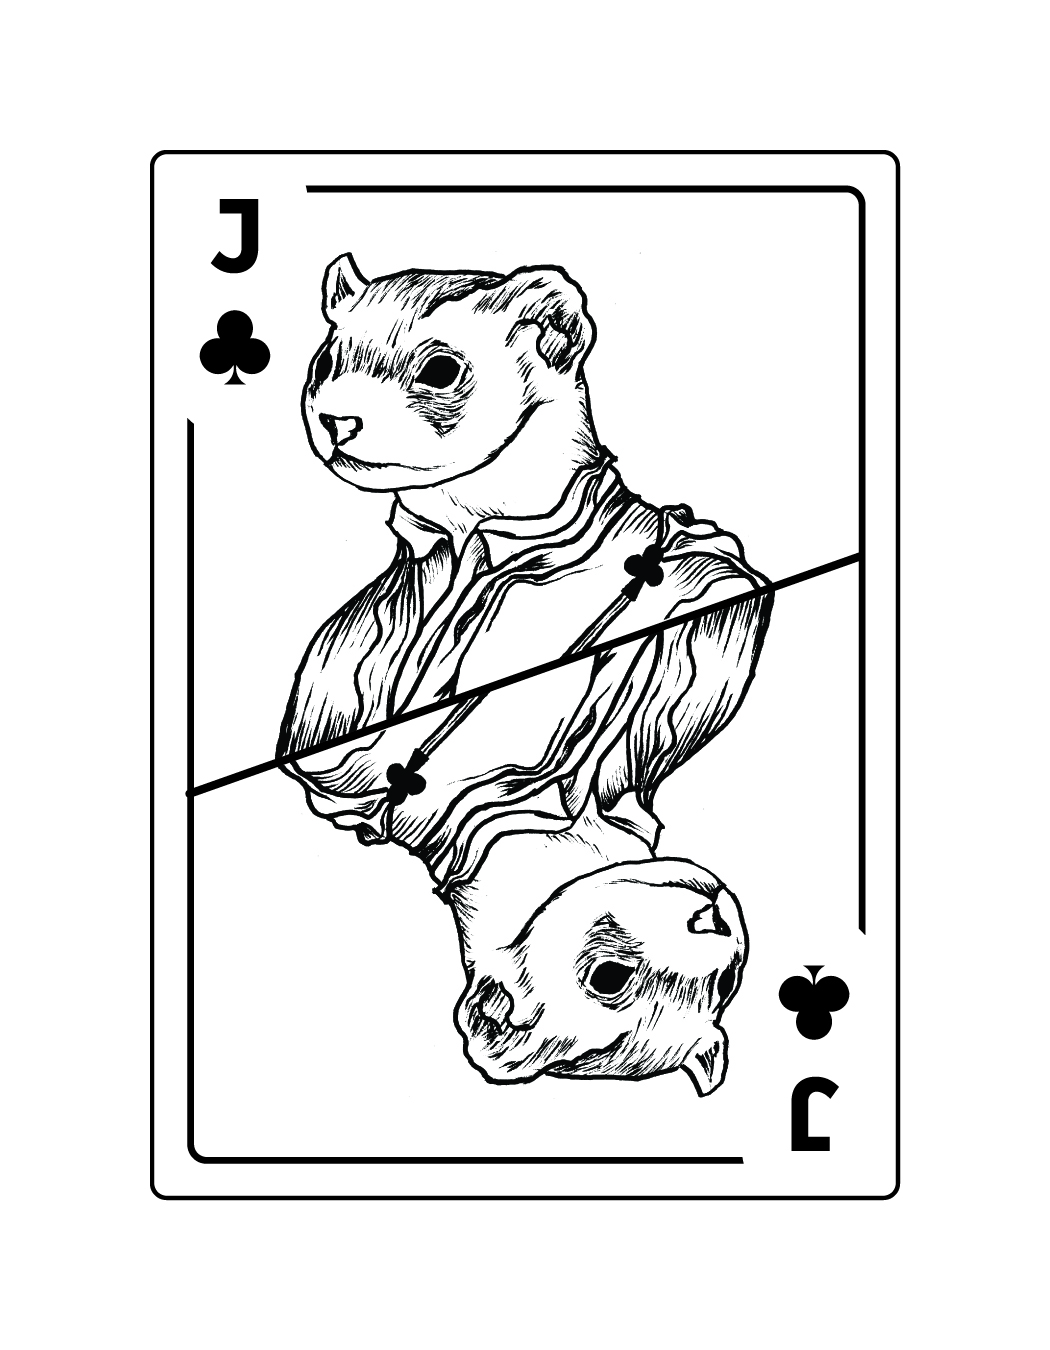 card_draft_1-03.jpg